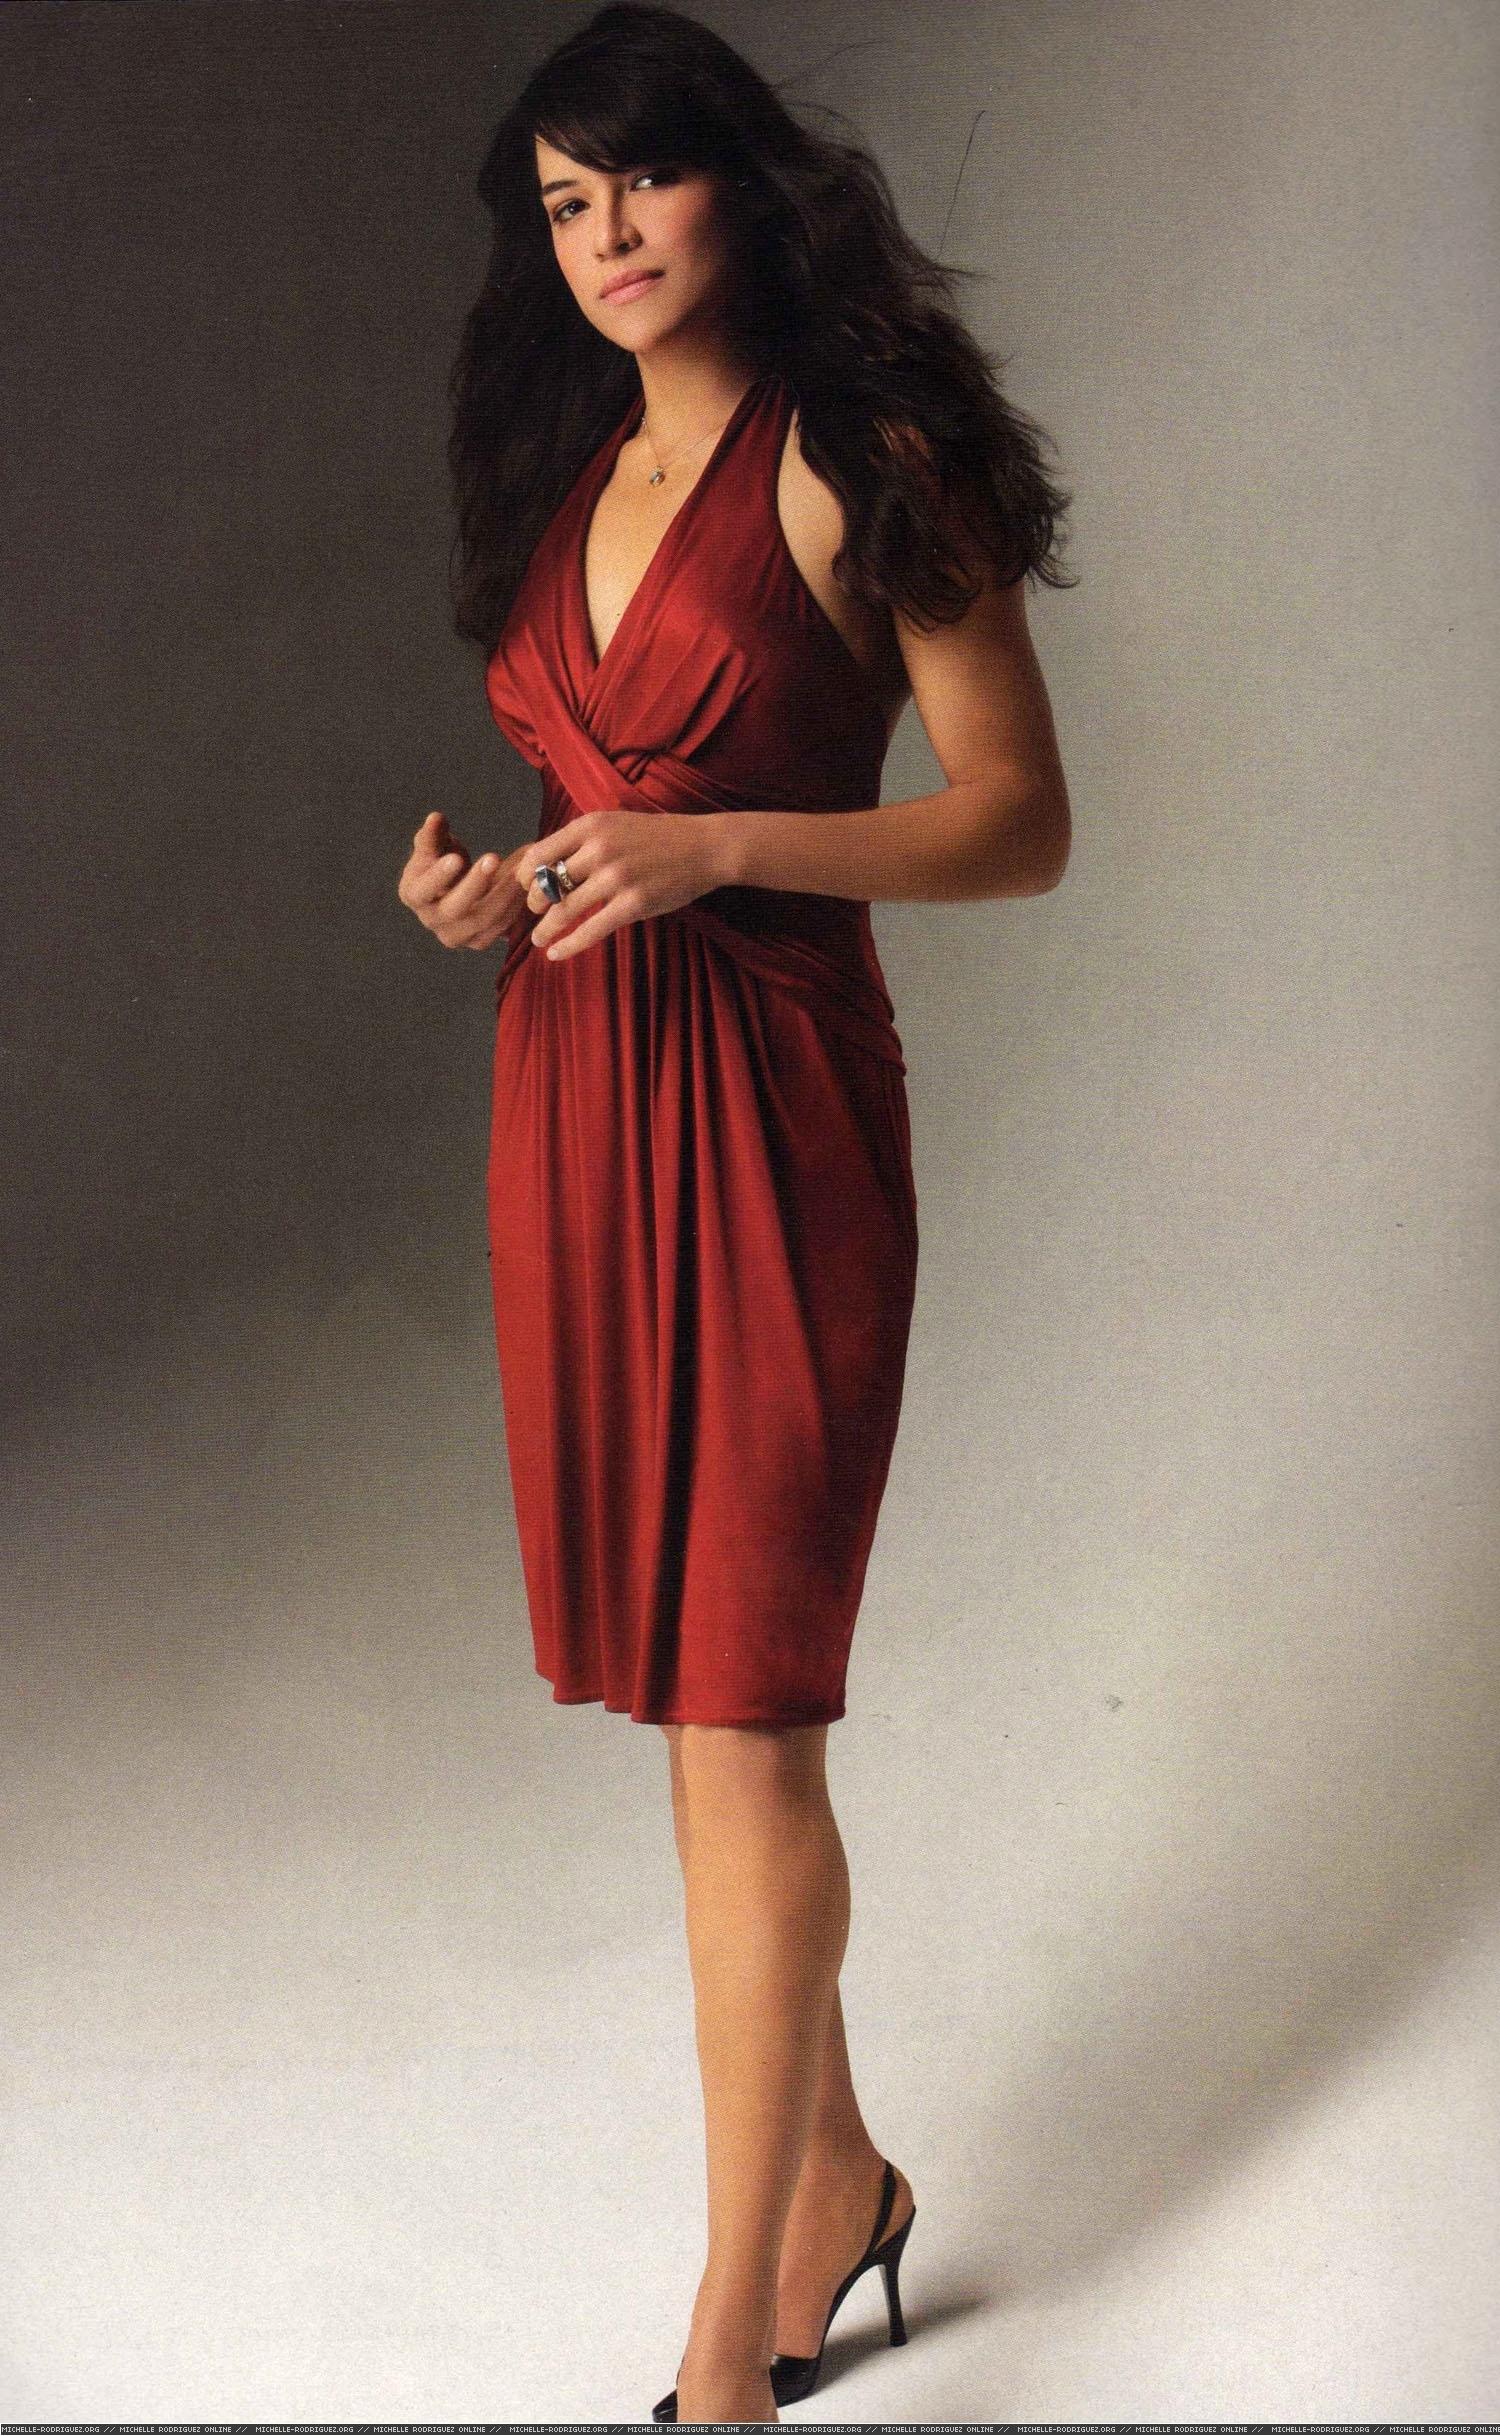 Michelle in Viva Magazine